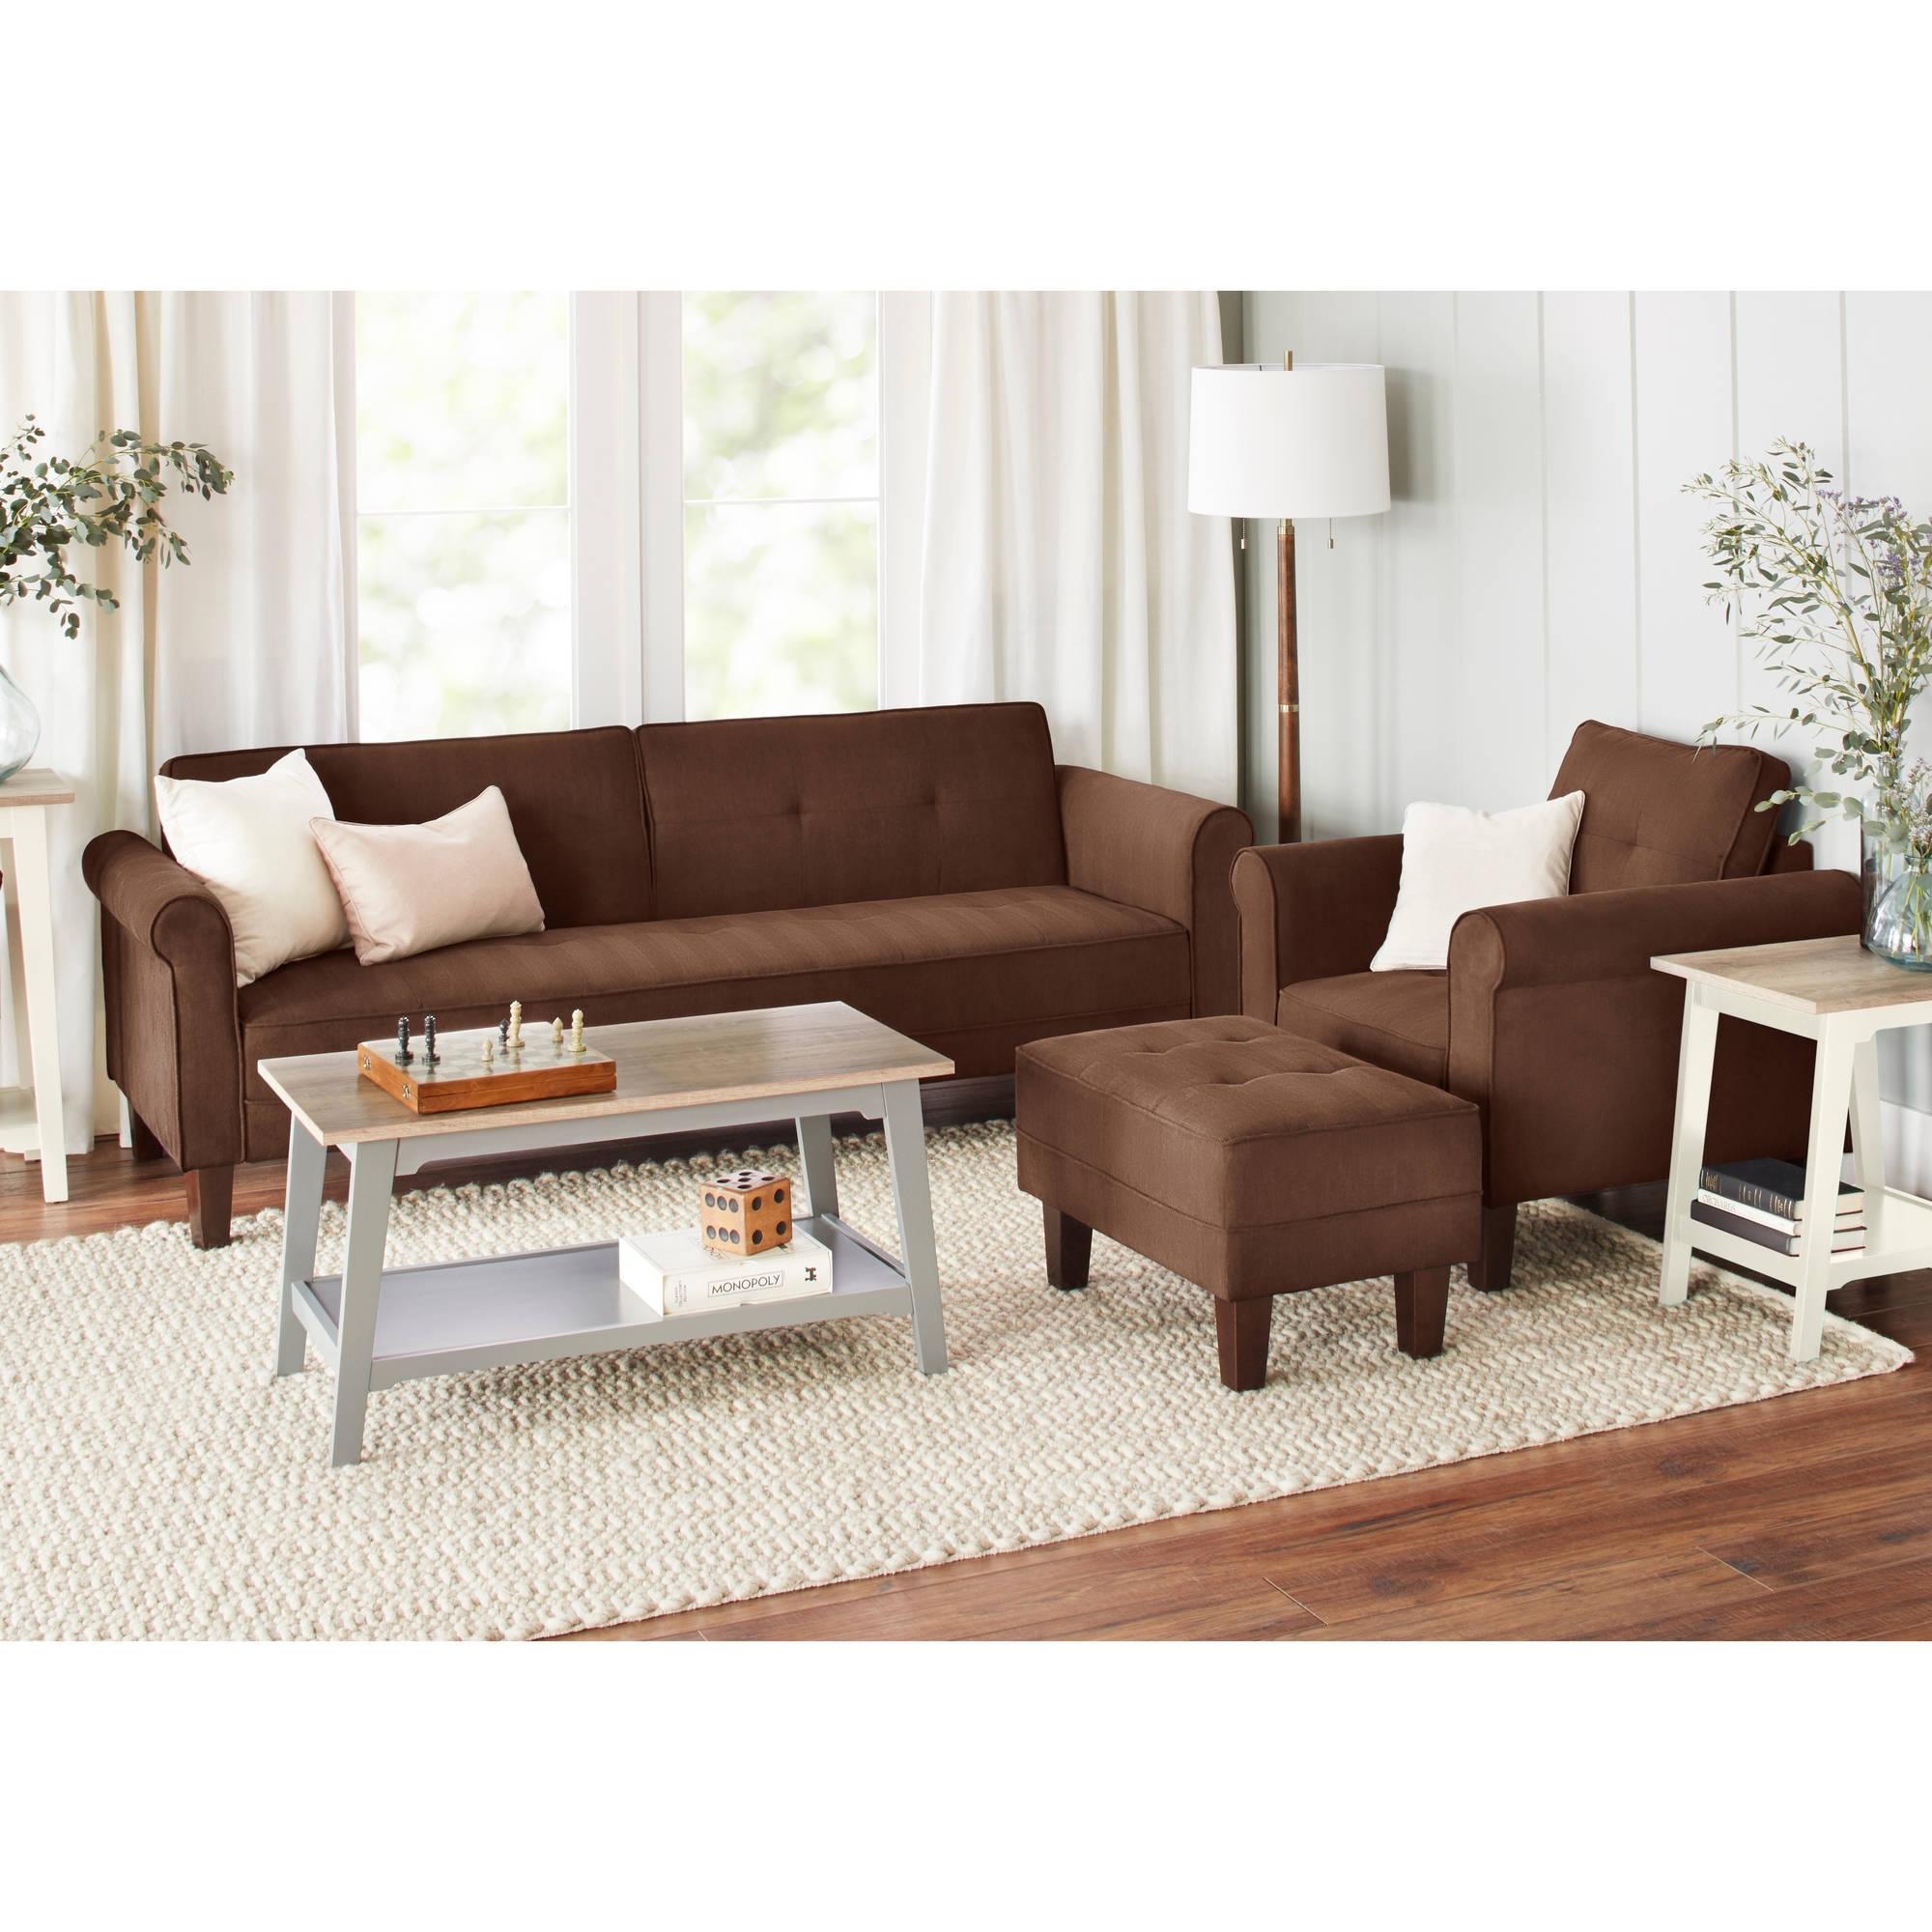 Furniture : Living Room Sofa Set Designs 2015 Living Room Sets With Regard To Kansas City Mo Sectional Sofas (View 4 of 10)